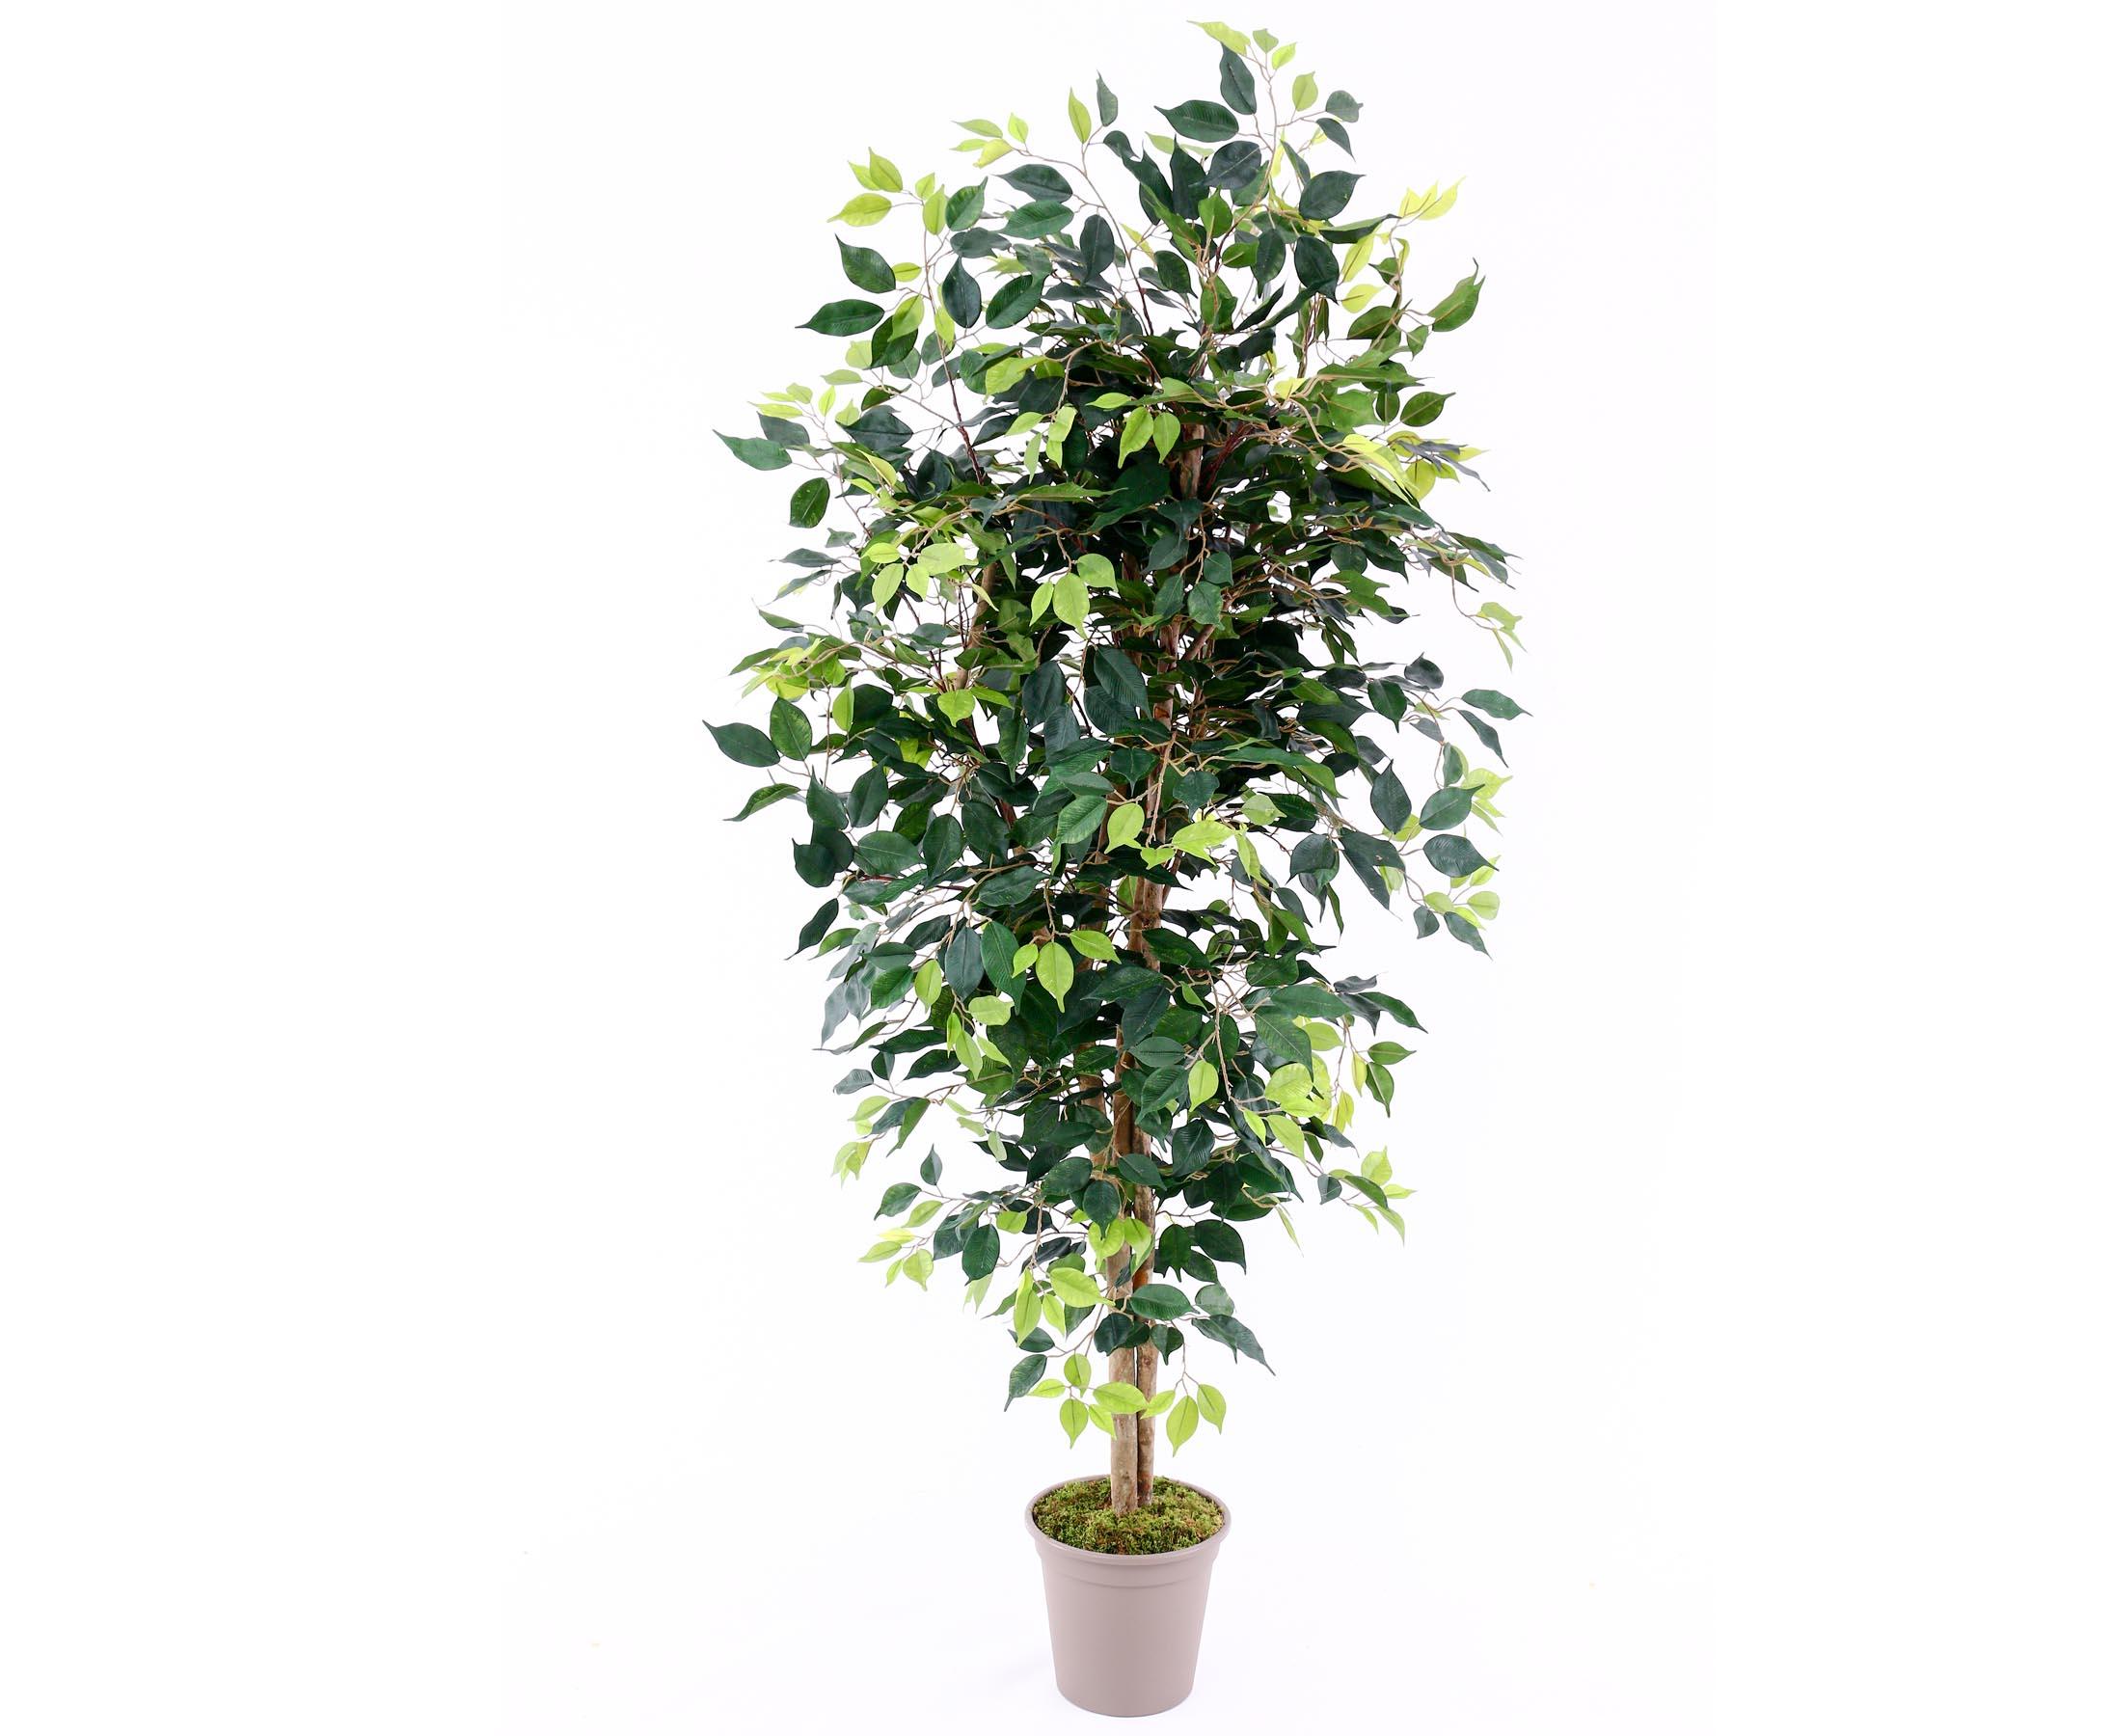 120 cm Zitronenbaum Kunstbaum Kunstpflanze Dekobaum